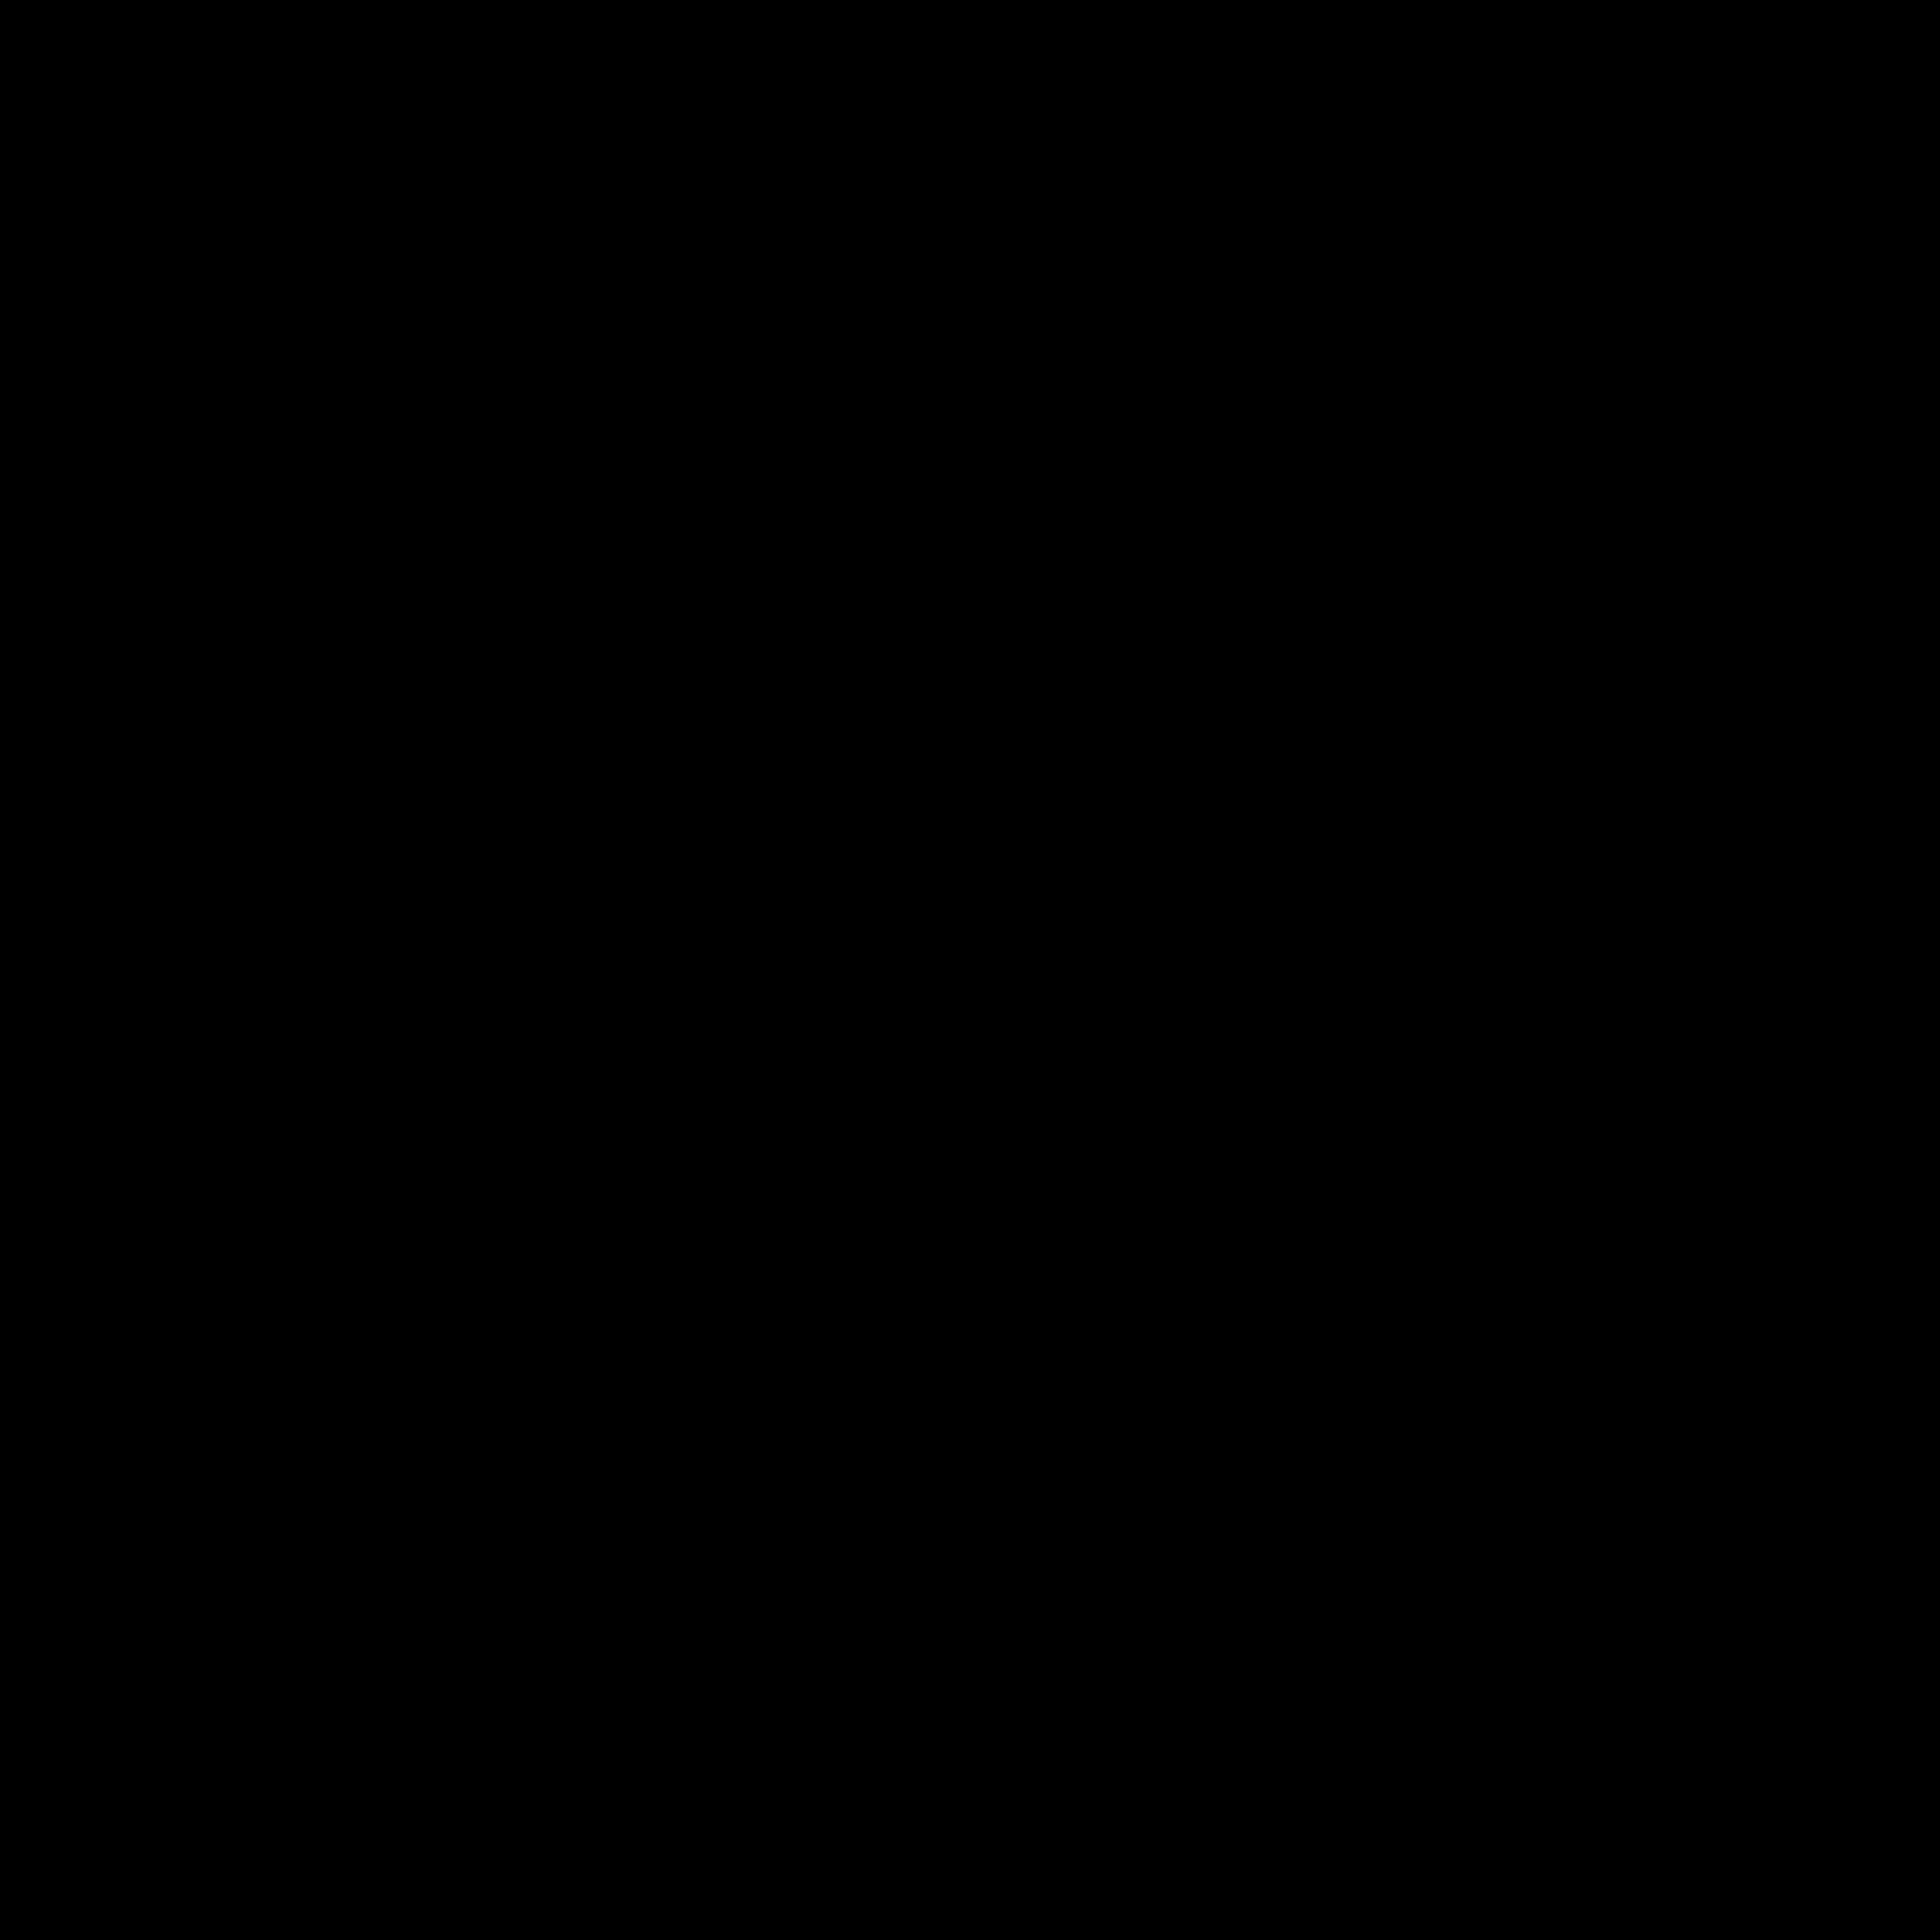 simple airplane silhouette tattoo